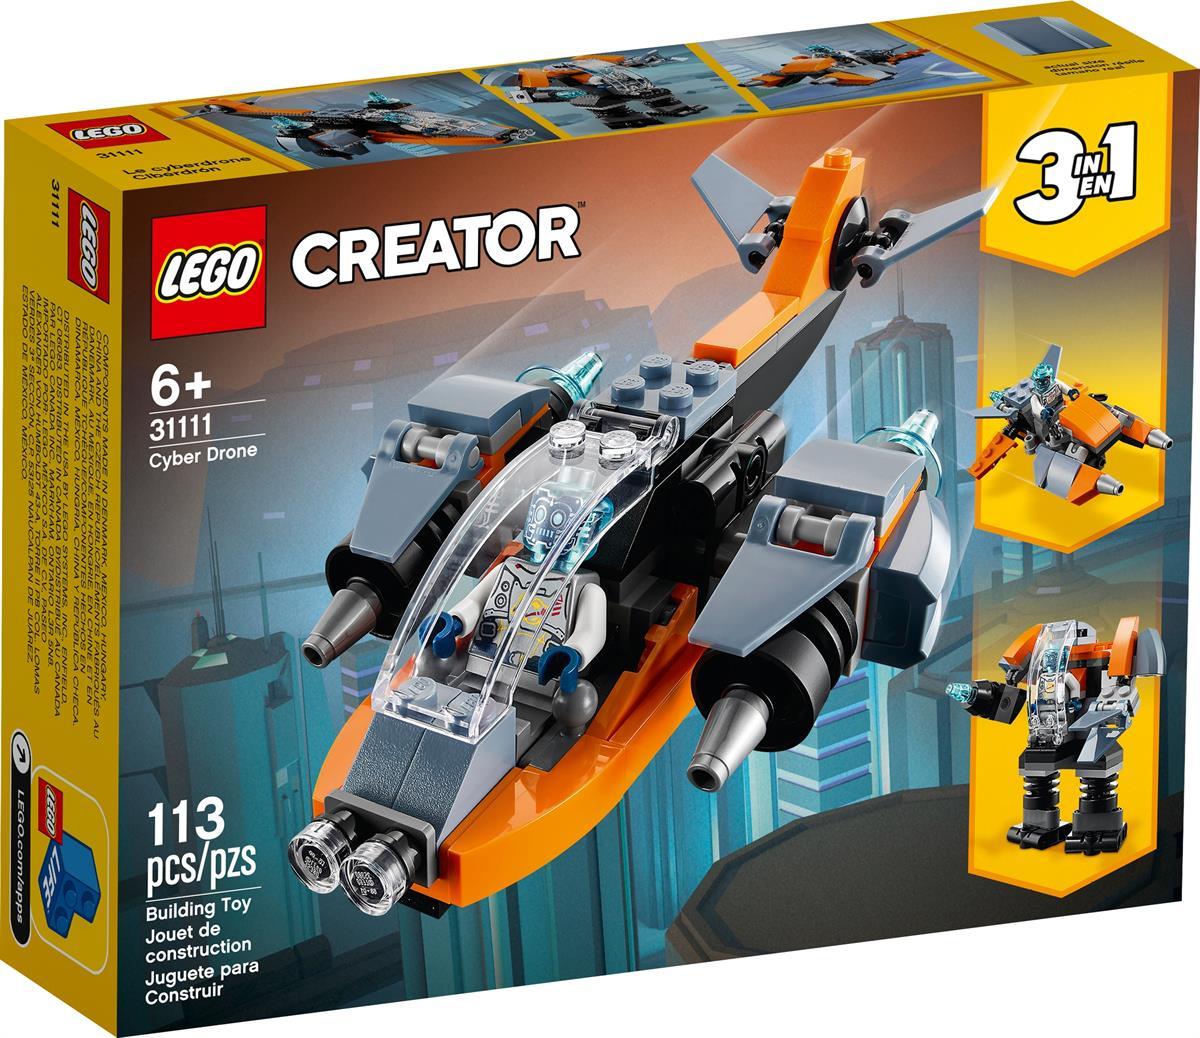 LEGO 31111 CYBER DRONE CREATOR